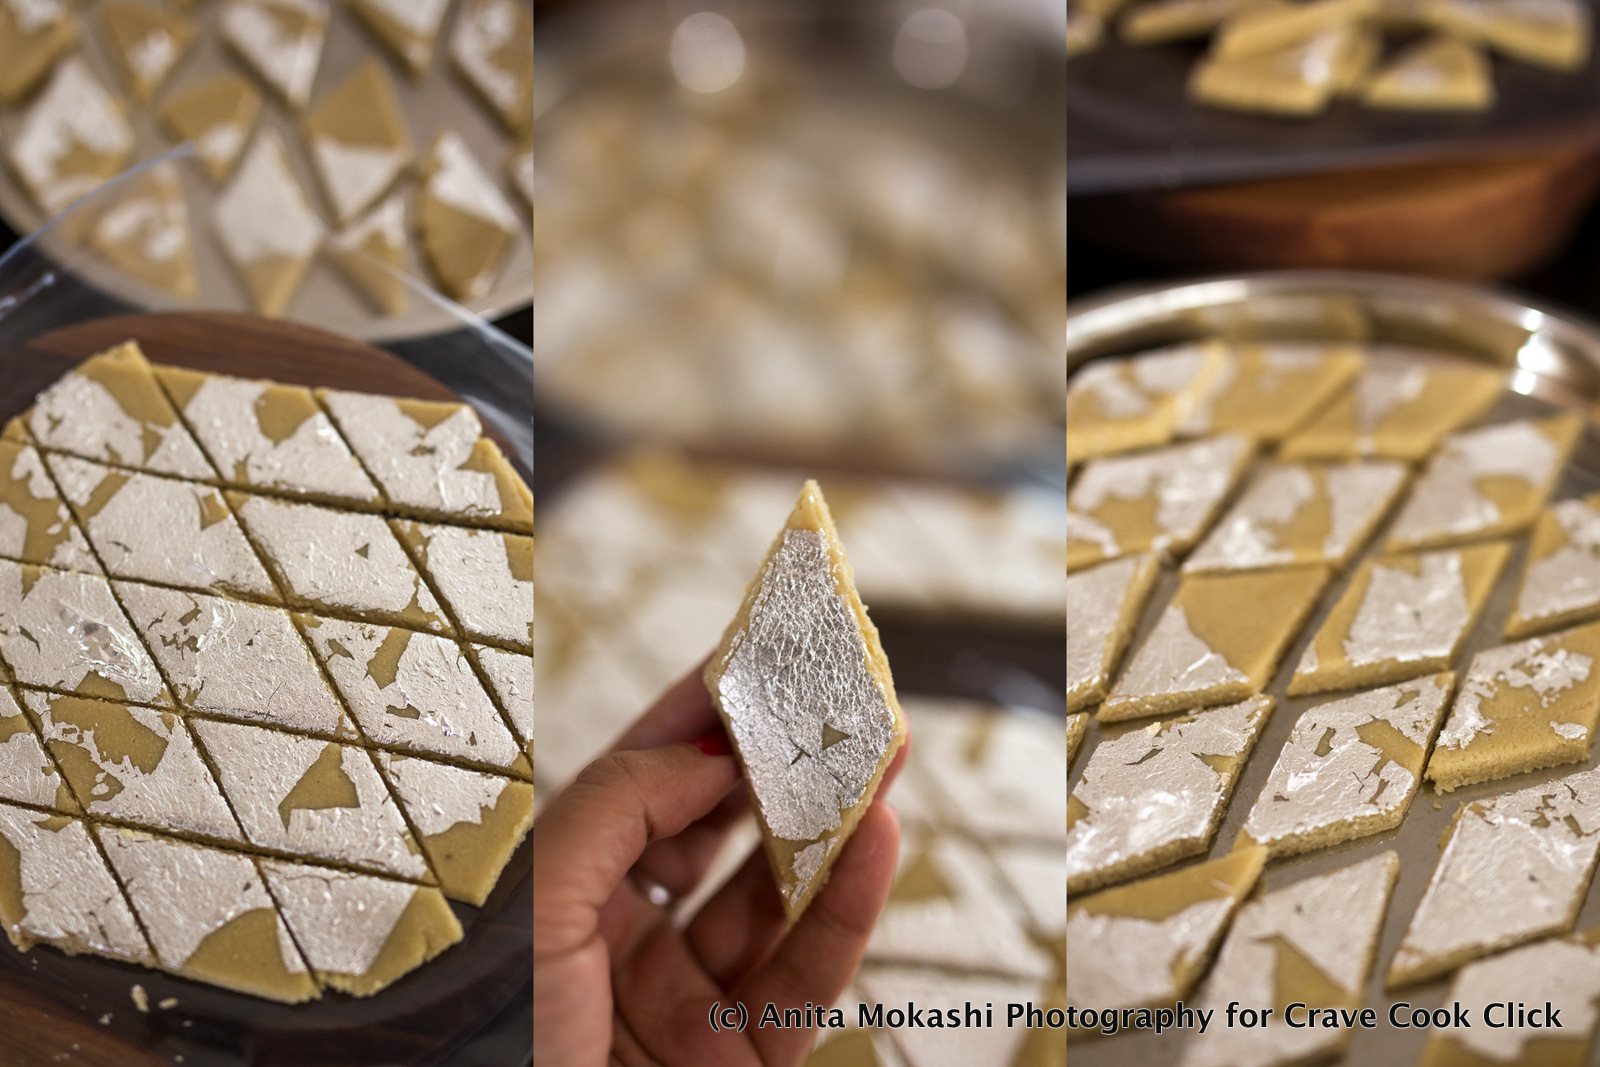 Dhantrayodashi, Dhanteras, Kaju katli recipe, diwali, indian festivals, diwali recipes, diwali snacks, indian festivals, how to make kaju katli, indian sweets recipes